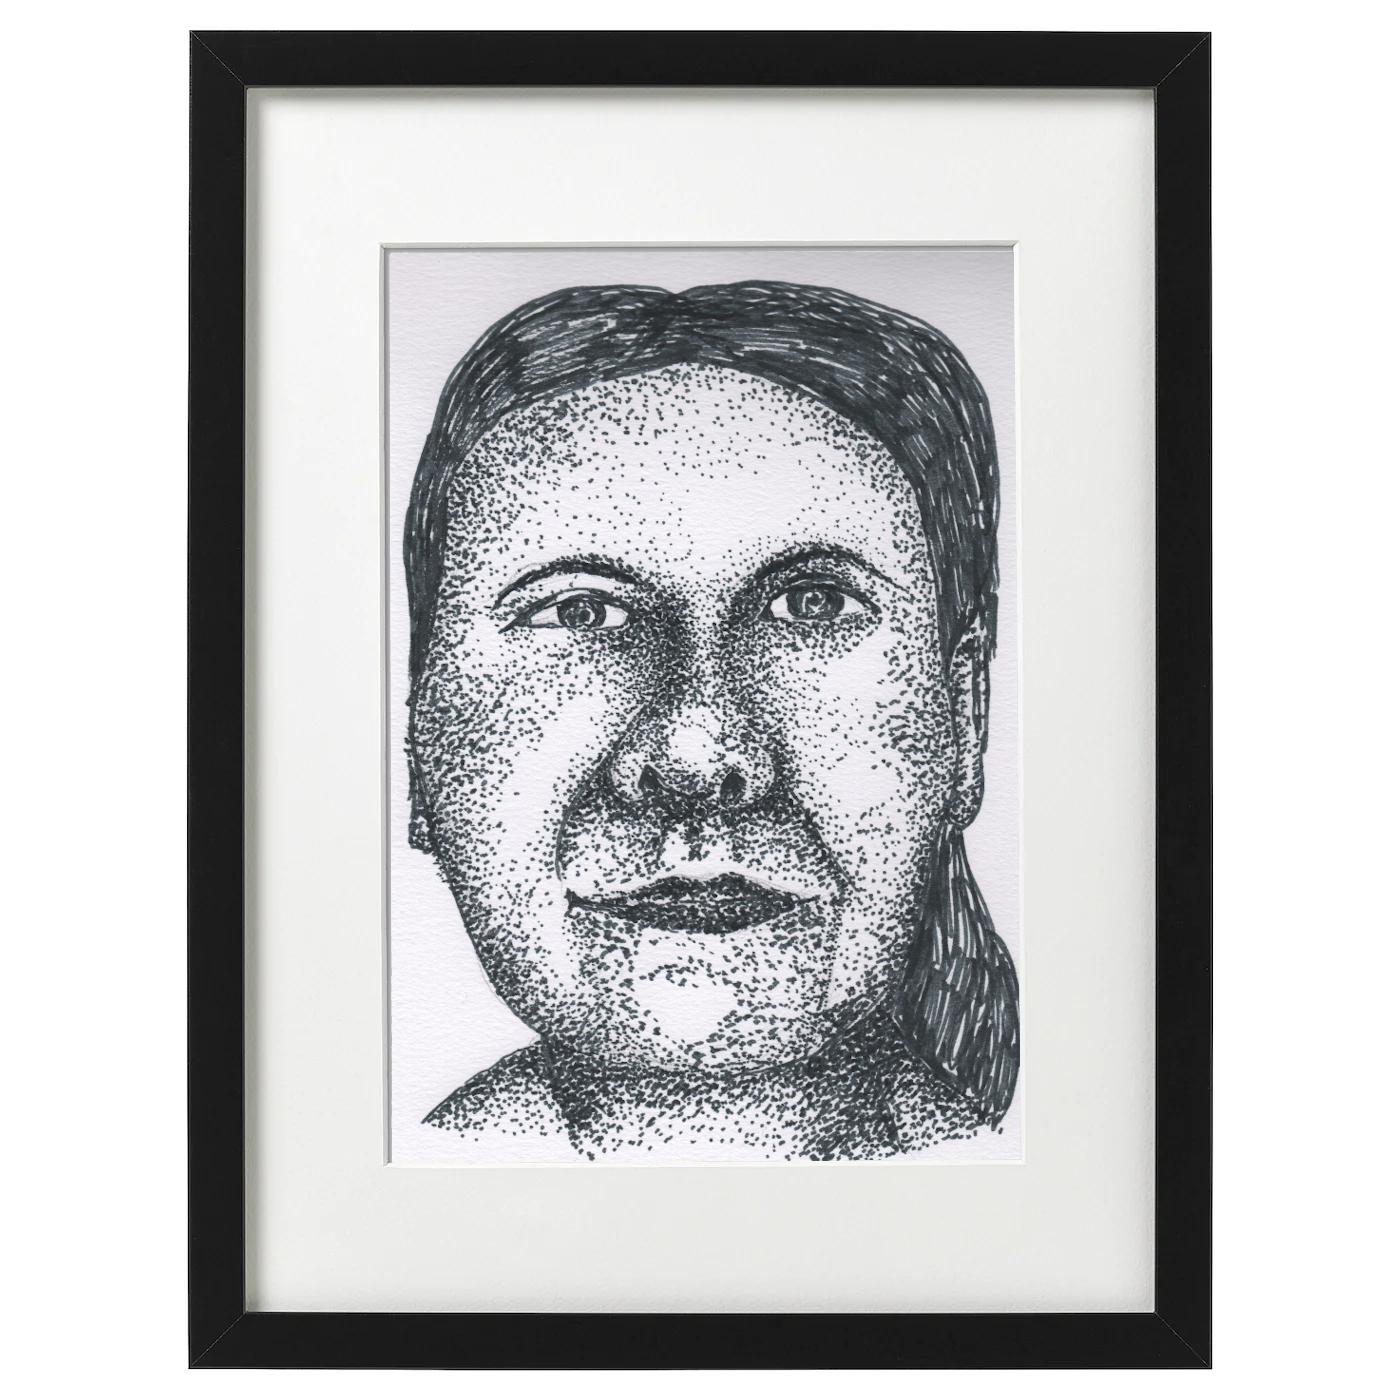 Self portrait - pointalism style